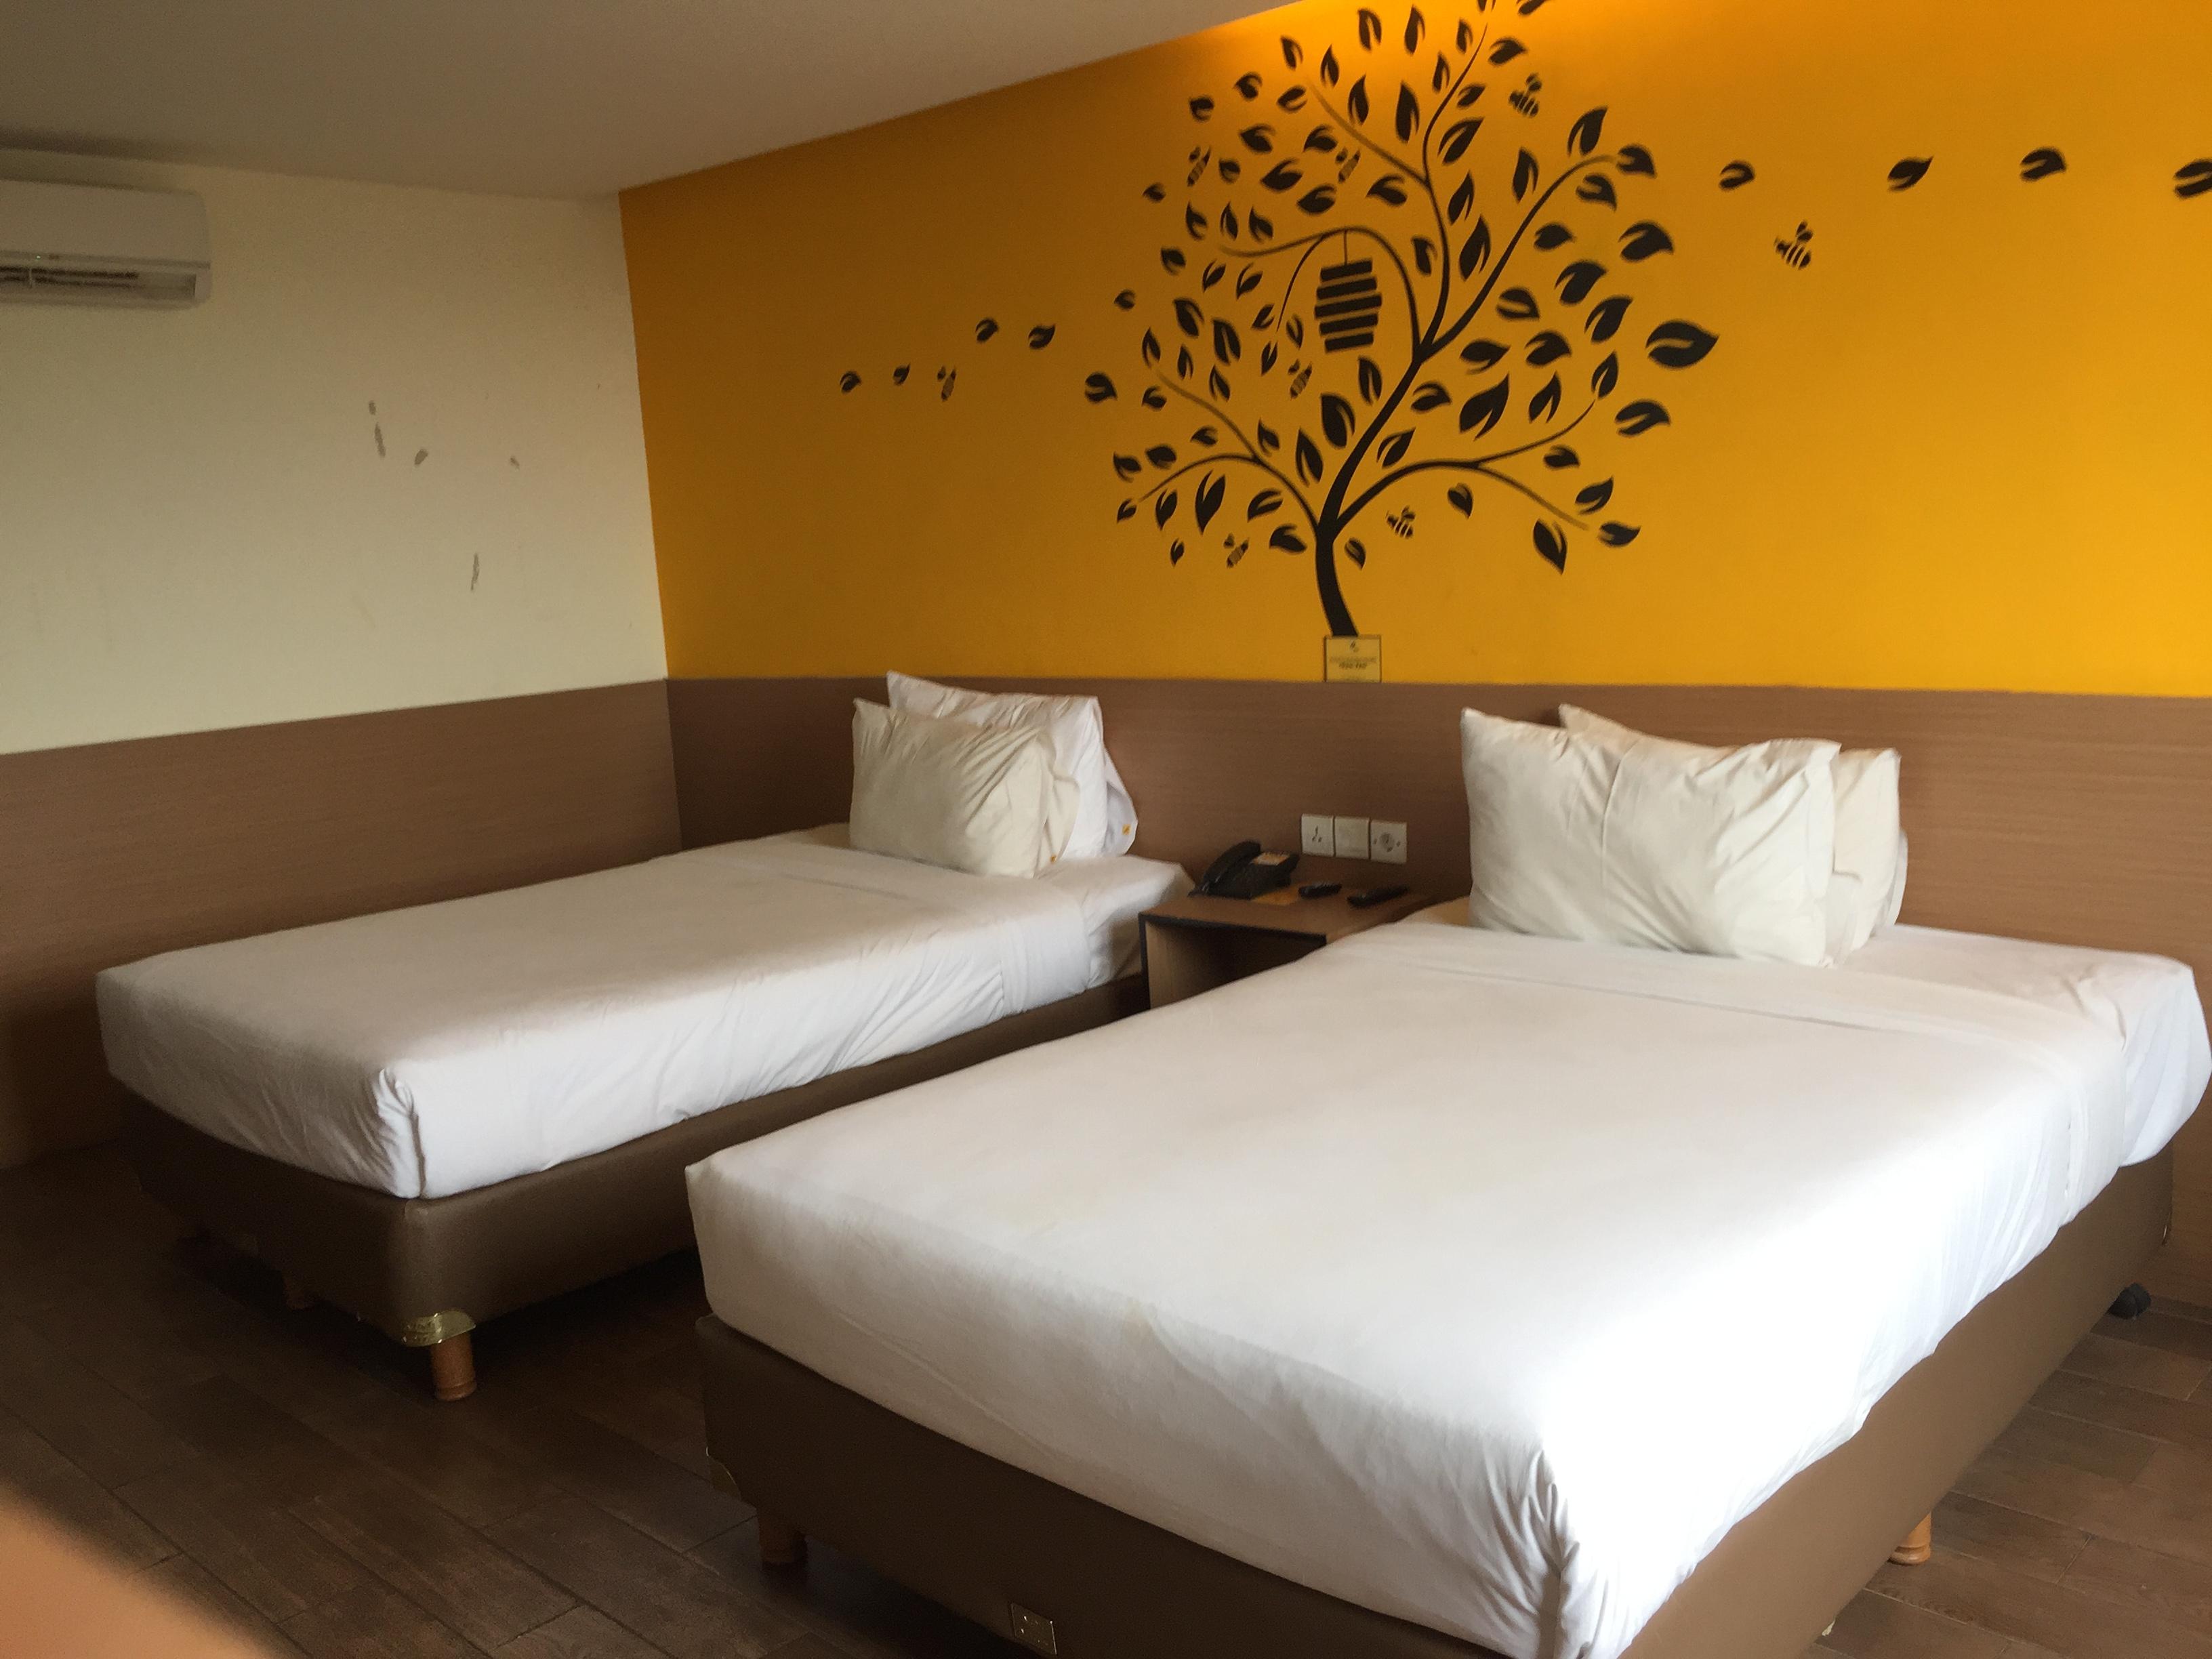 Menginap di Yellow Bee Hotel Tangerang dengan View Sungai Cisadane